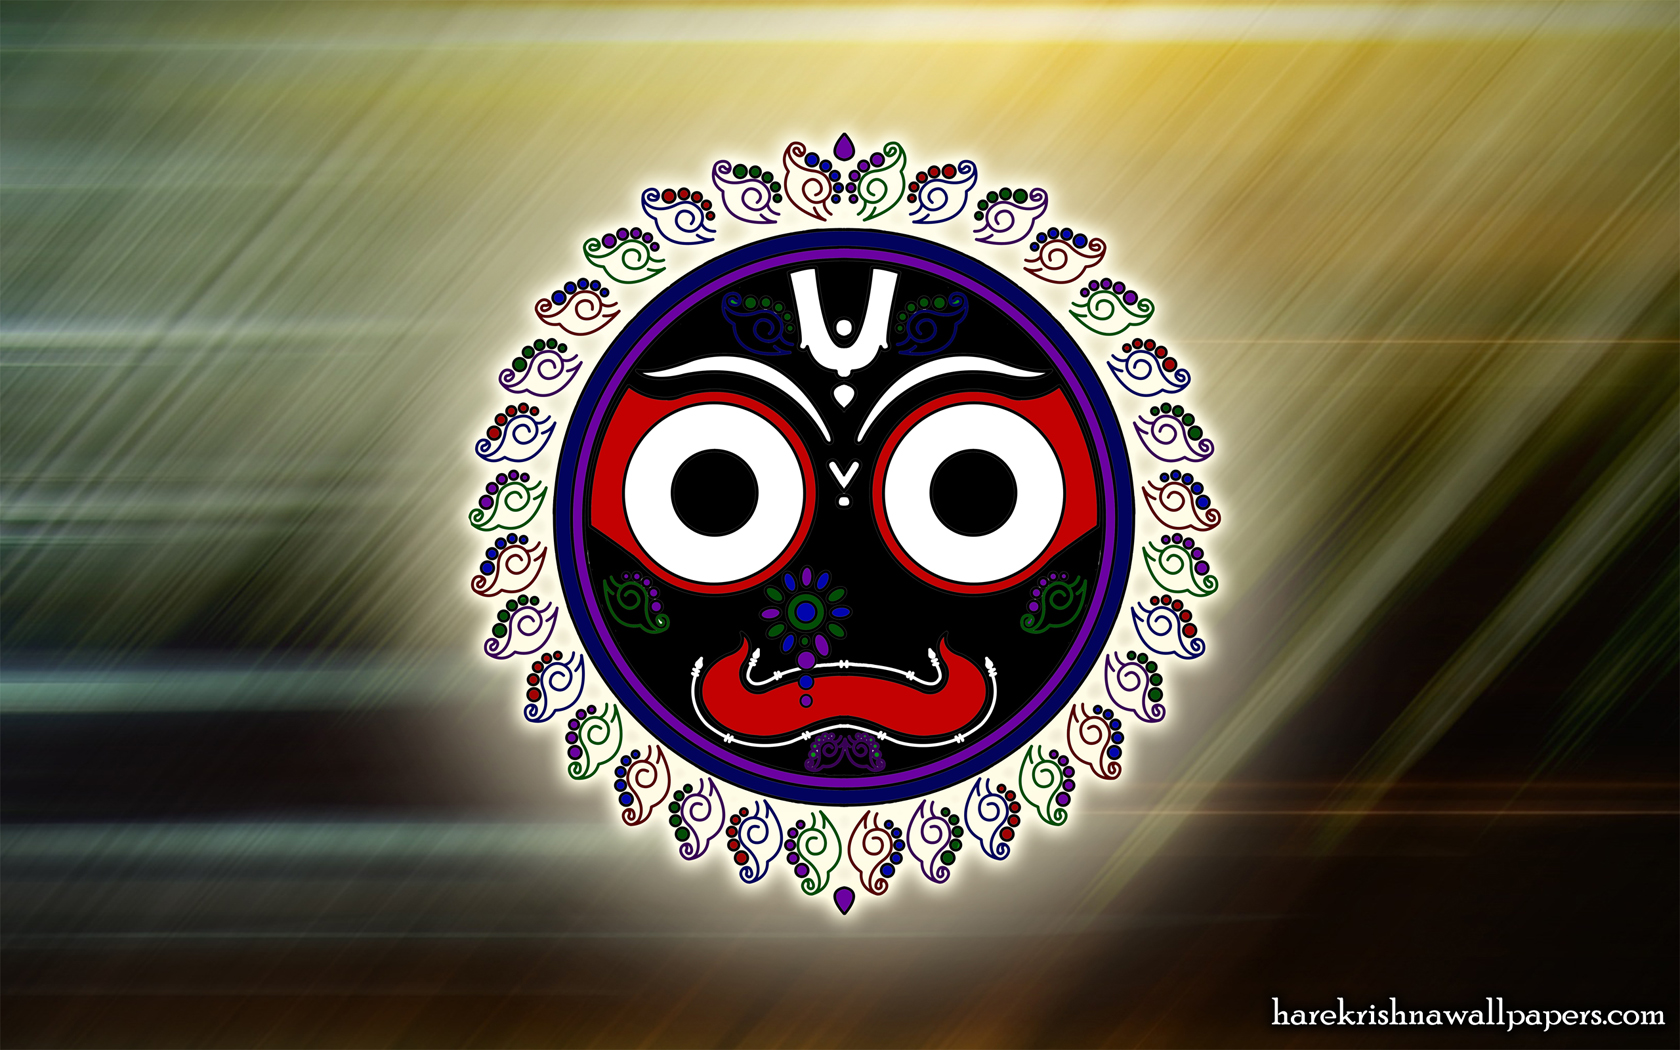 Jai Jagannath Wallpaper (037) Size 1680x1050 Download